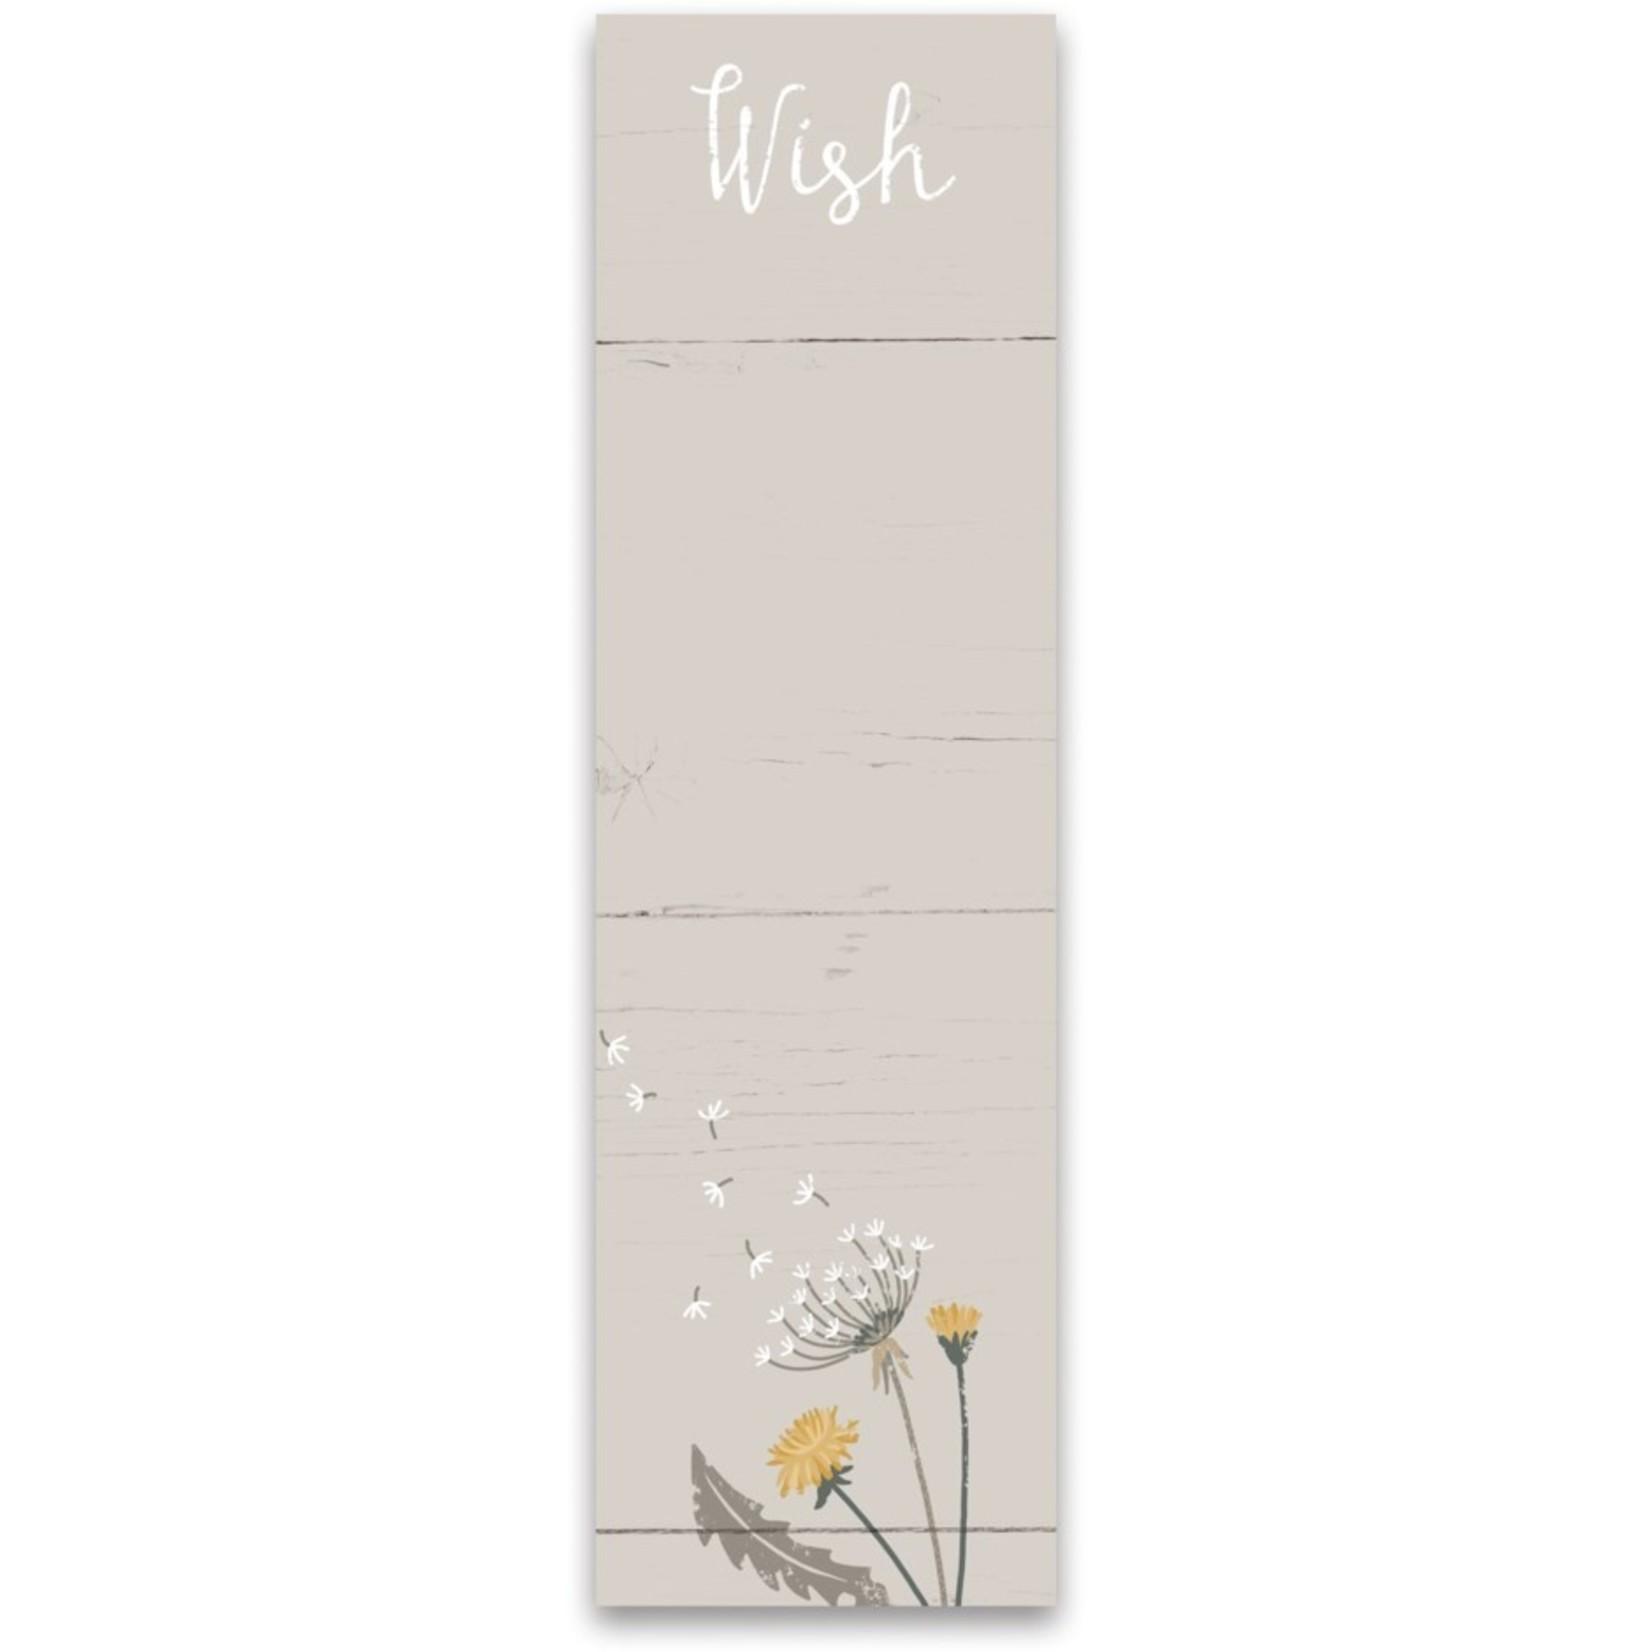 List Notepad - Wish